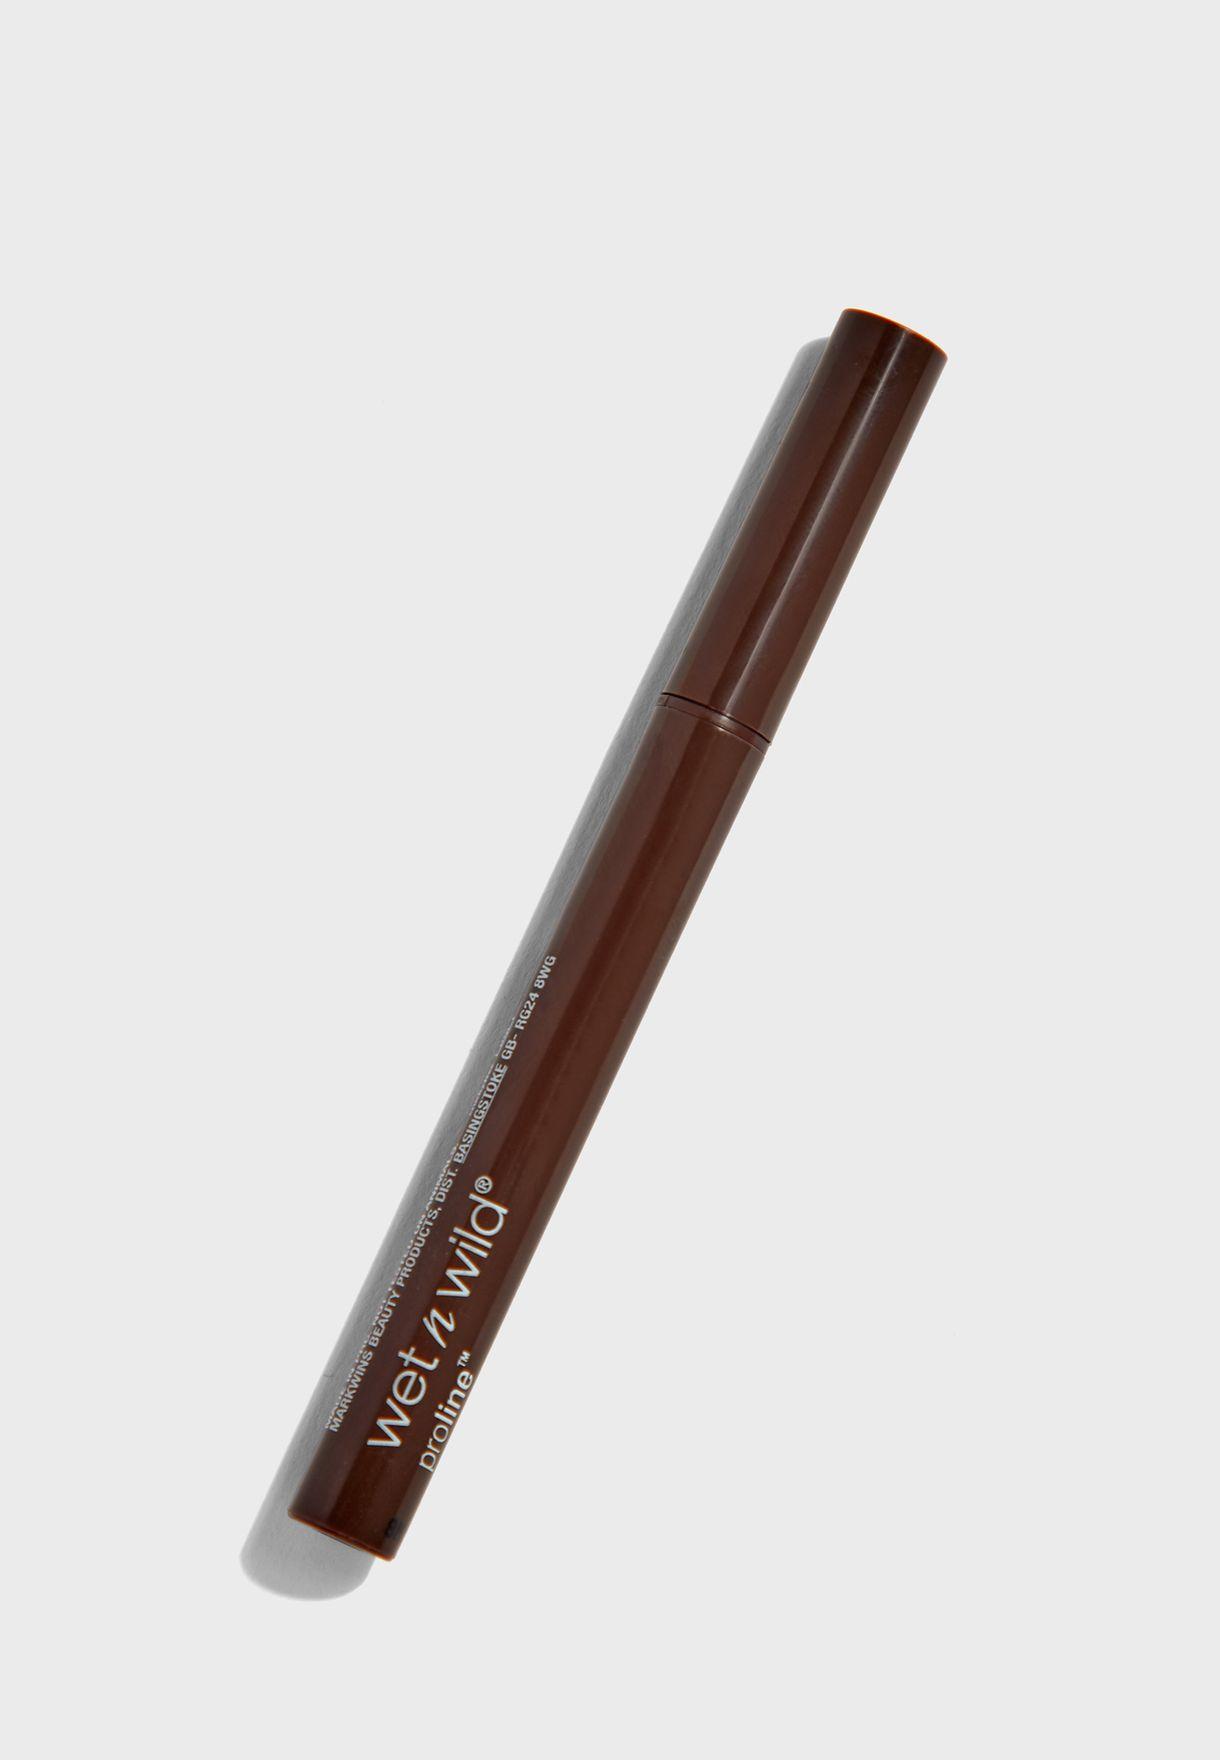 Felt tip eyeliner / crayon